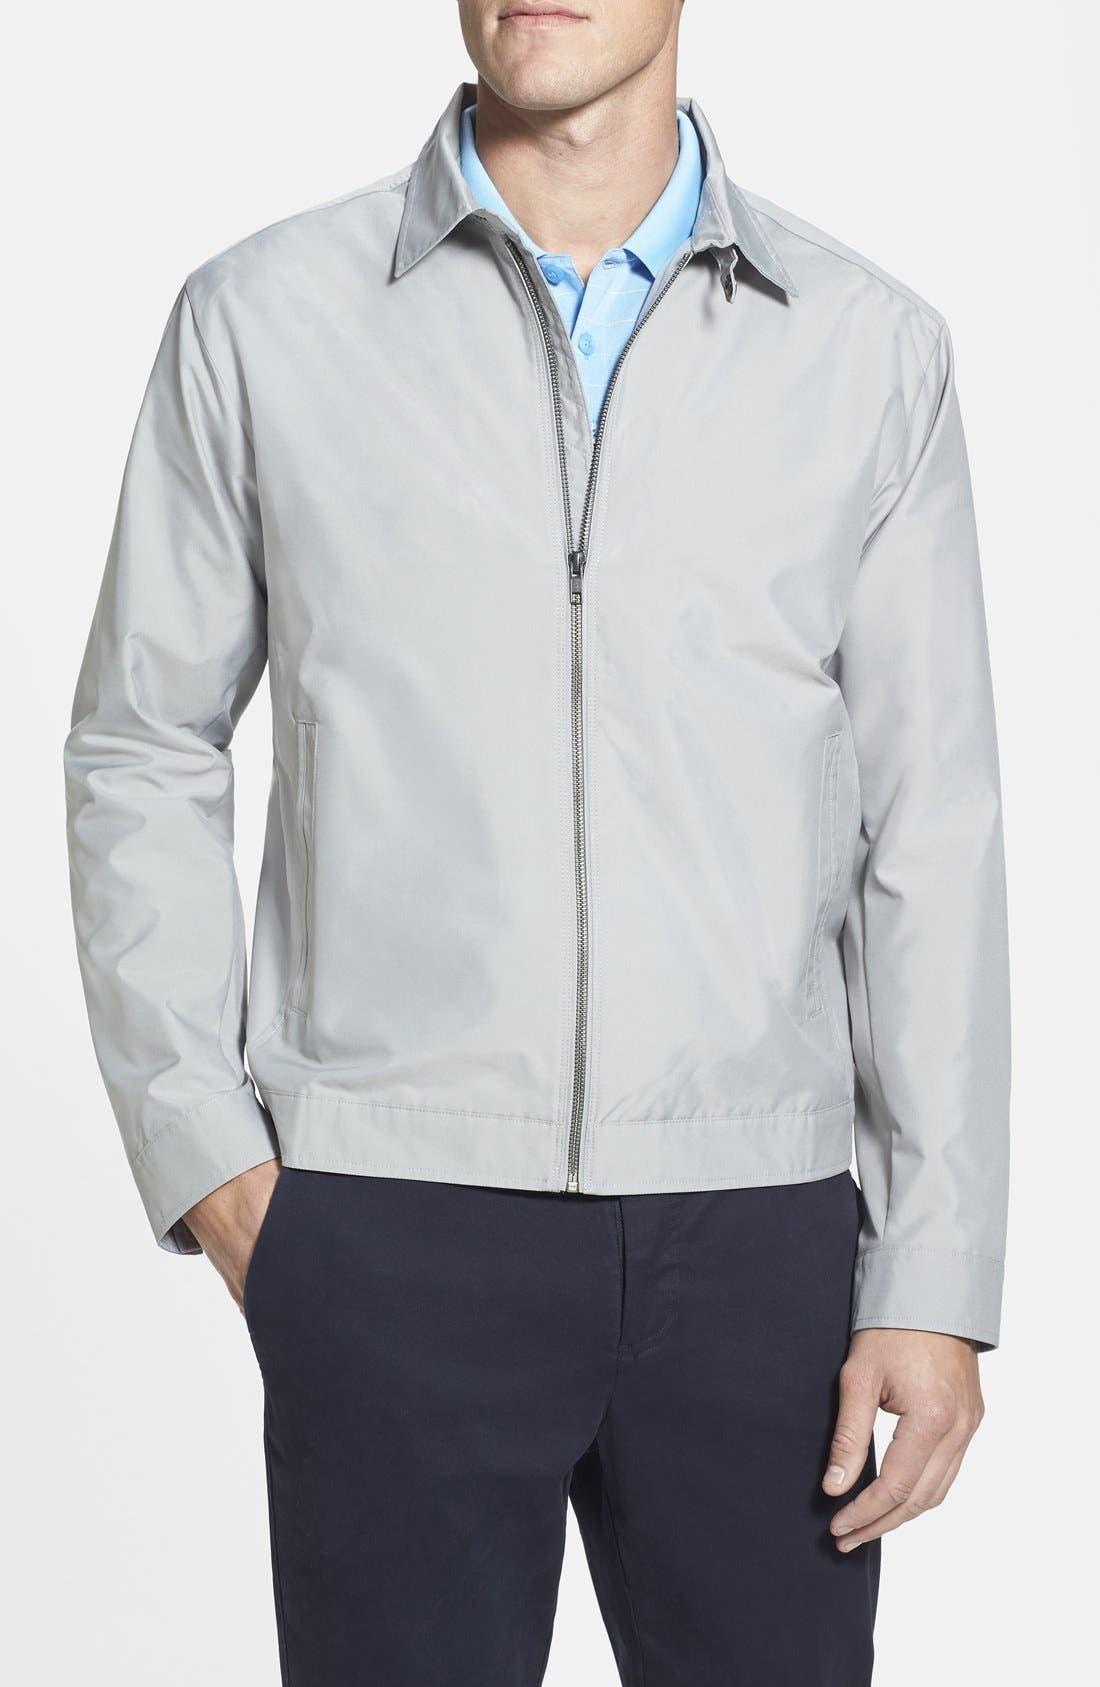 'WeatherTec Mason' Wind & Water Resistant Jacket,                             Main thumbnail 1, color,                             087